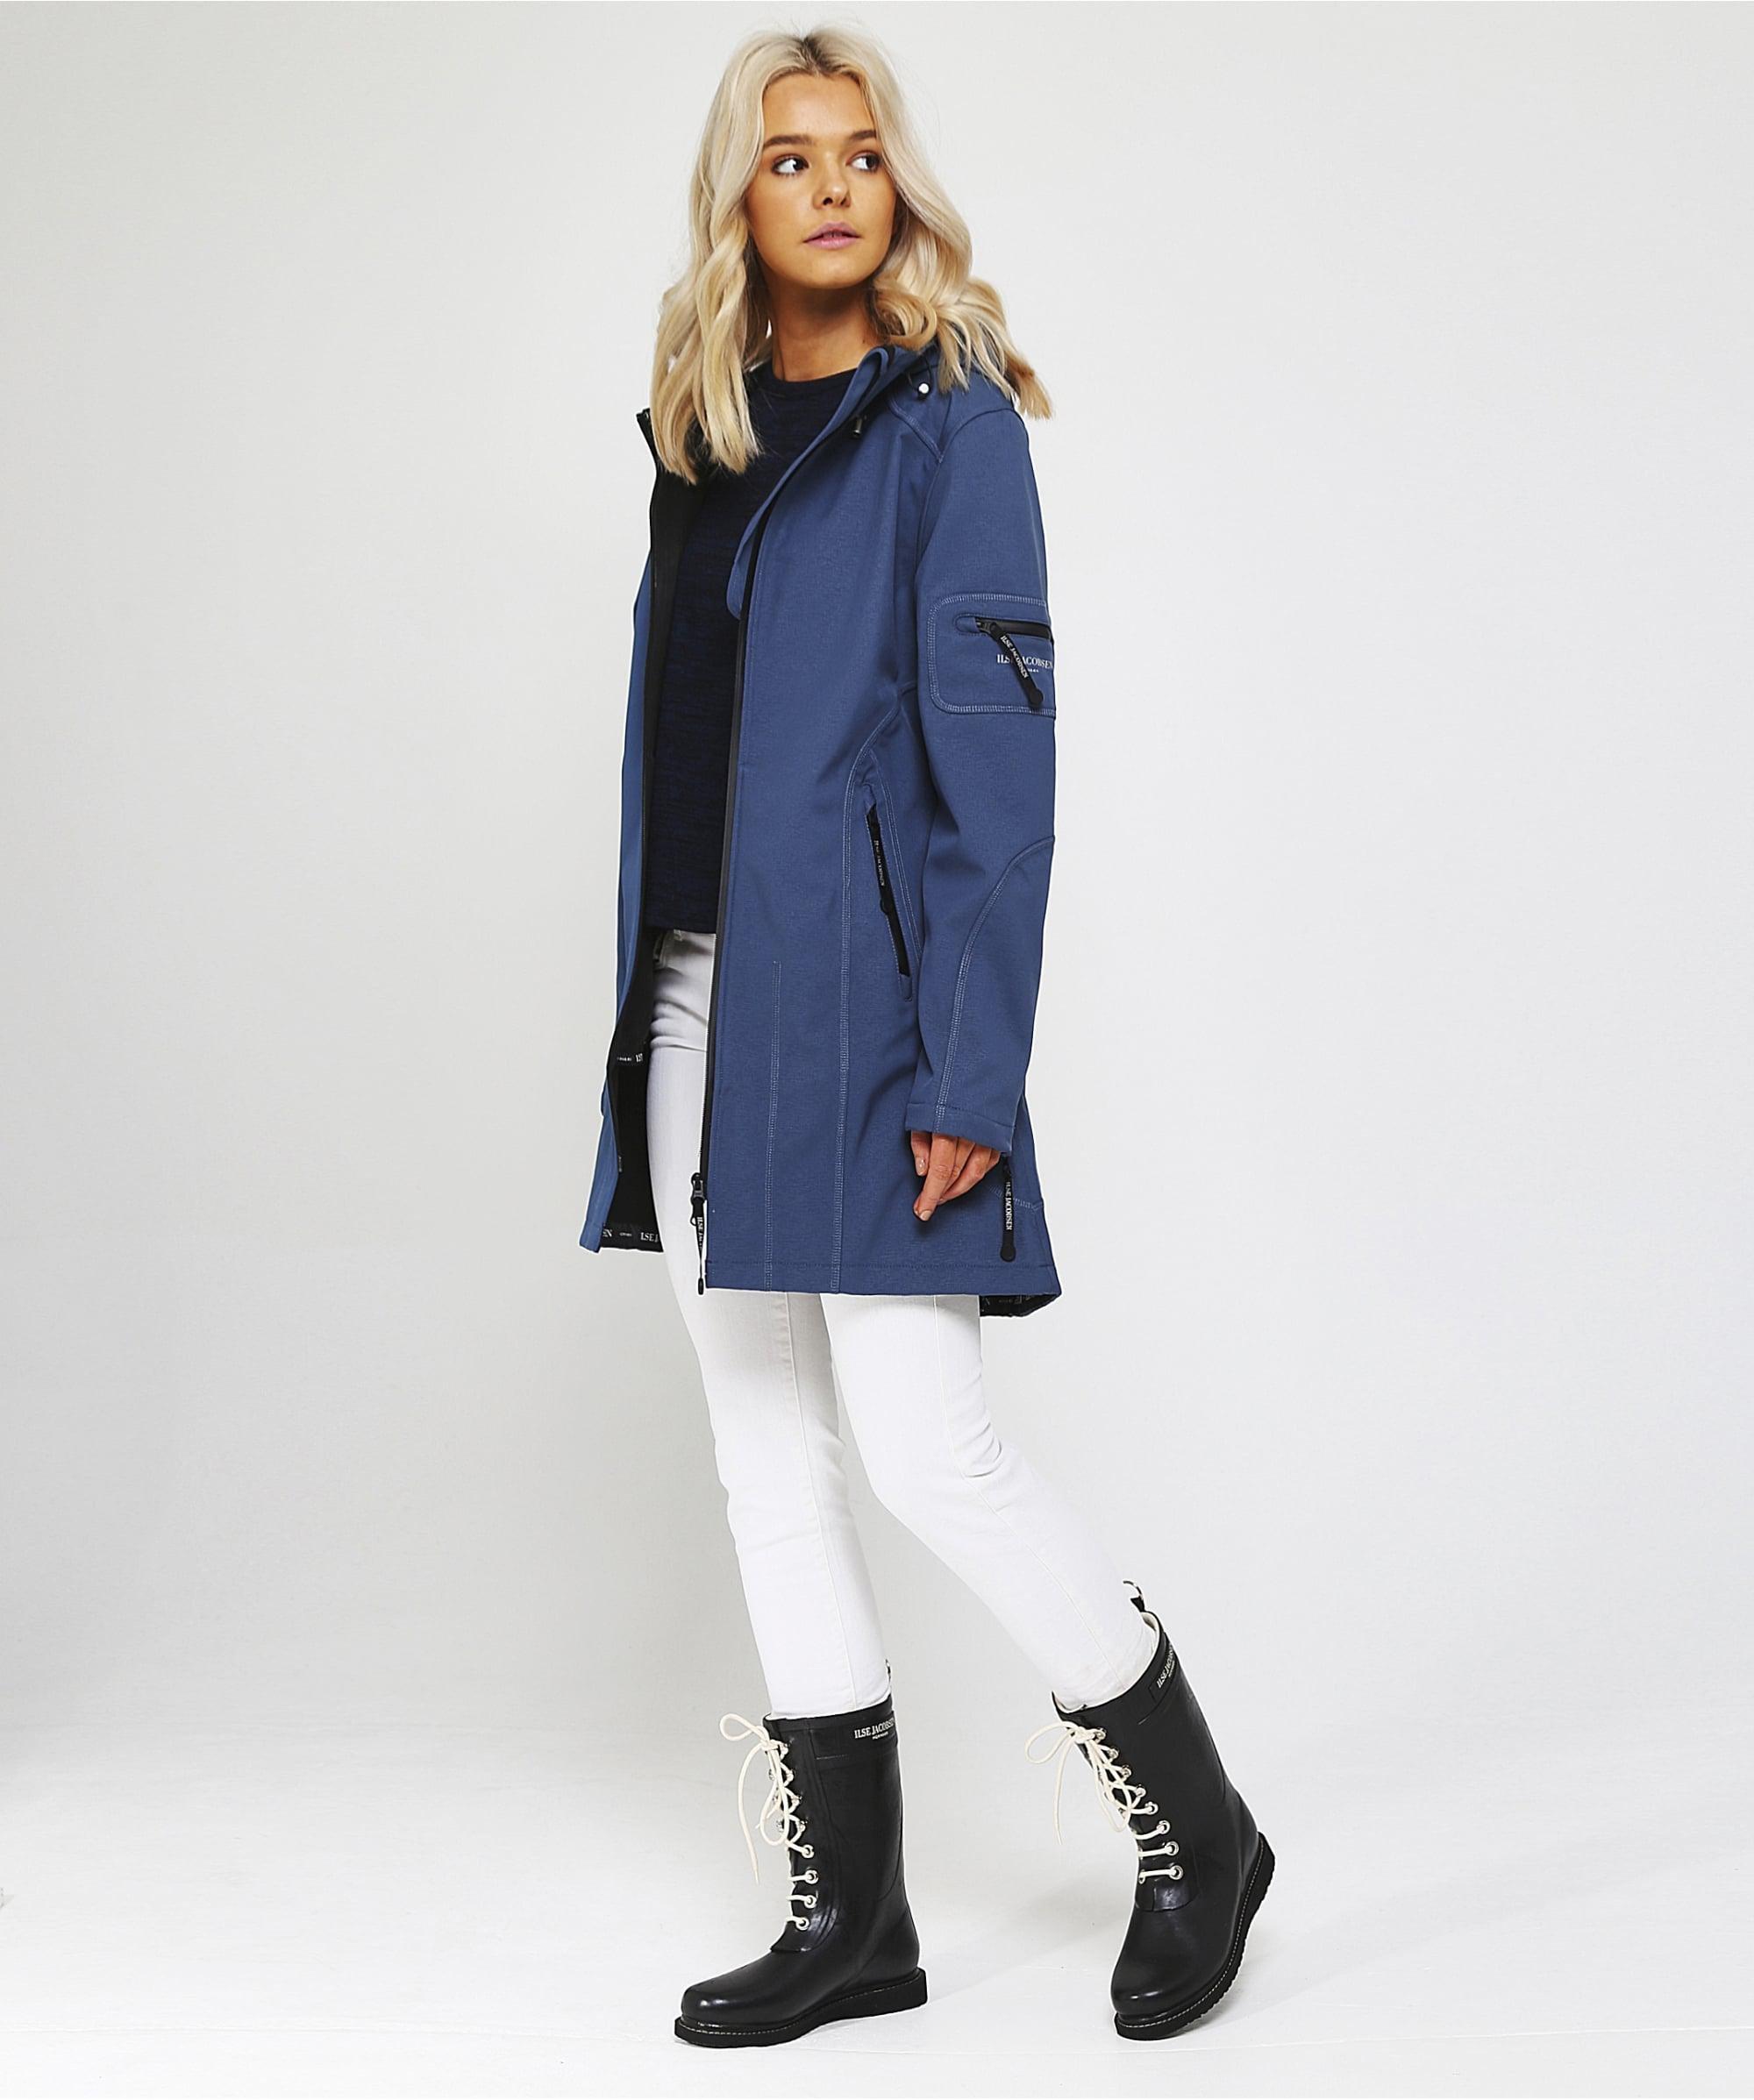 Ilse Jacobsen Synthetic Rain 07 Classic Raincoat In Blue